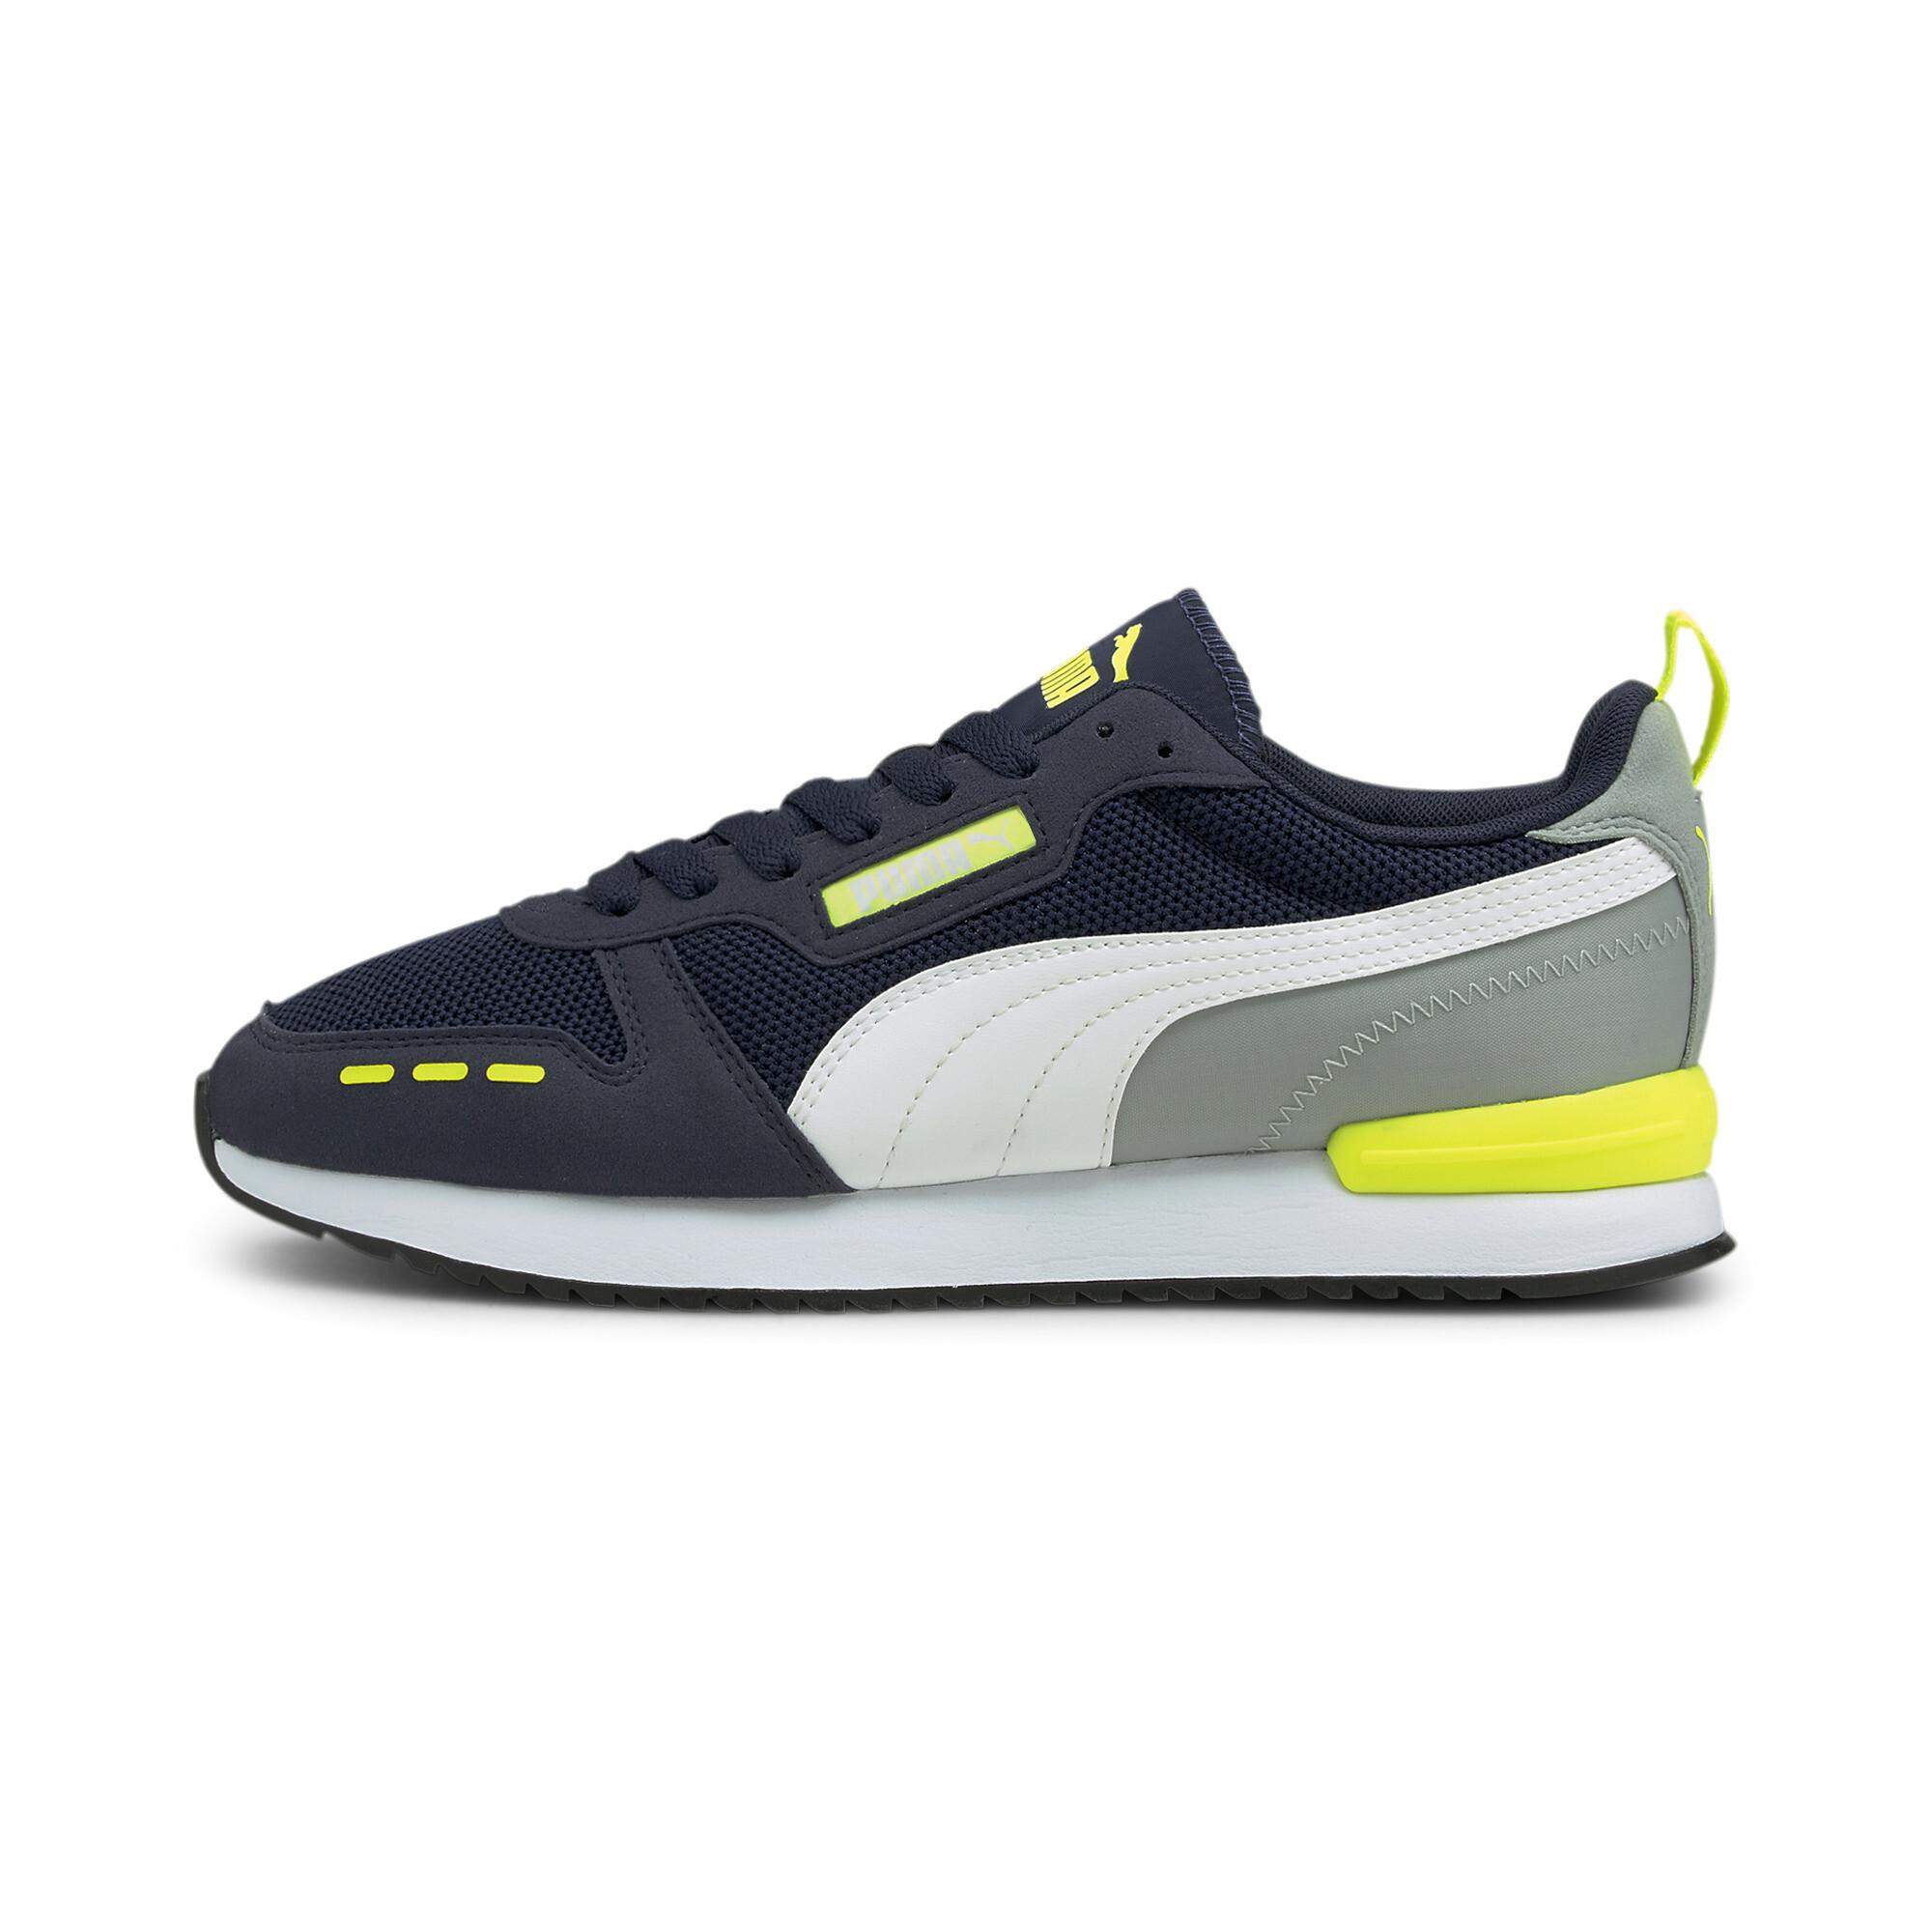 thumbnail 6 - PUMA-Men-039-s-R78-Sneakers